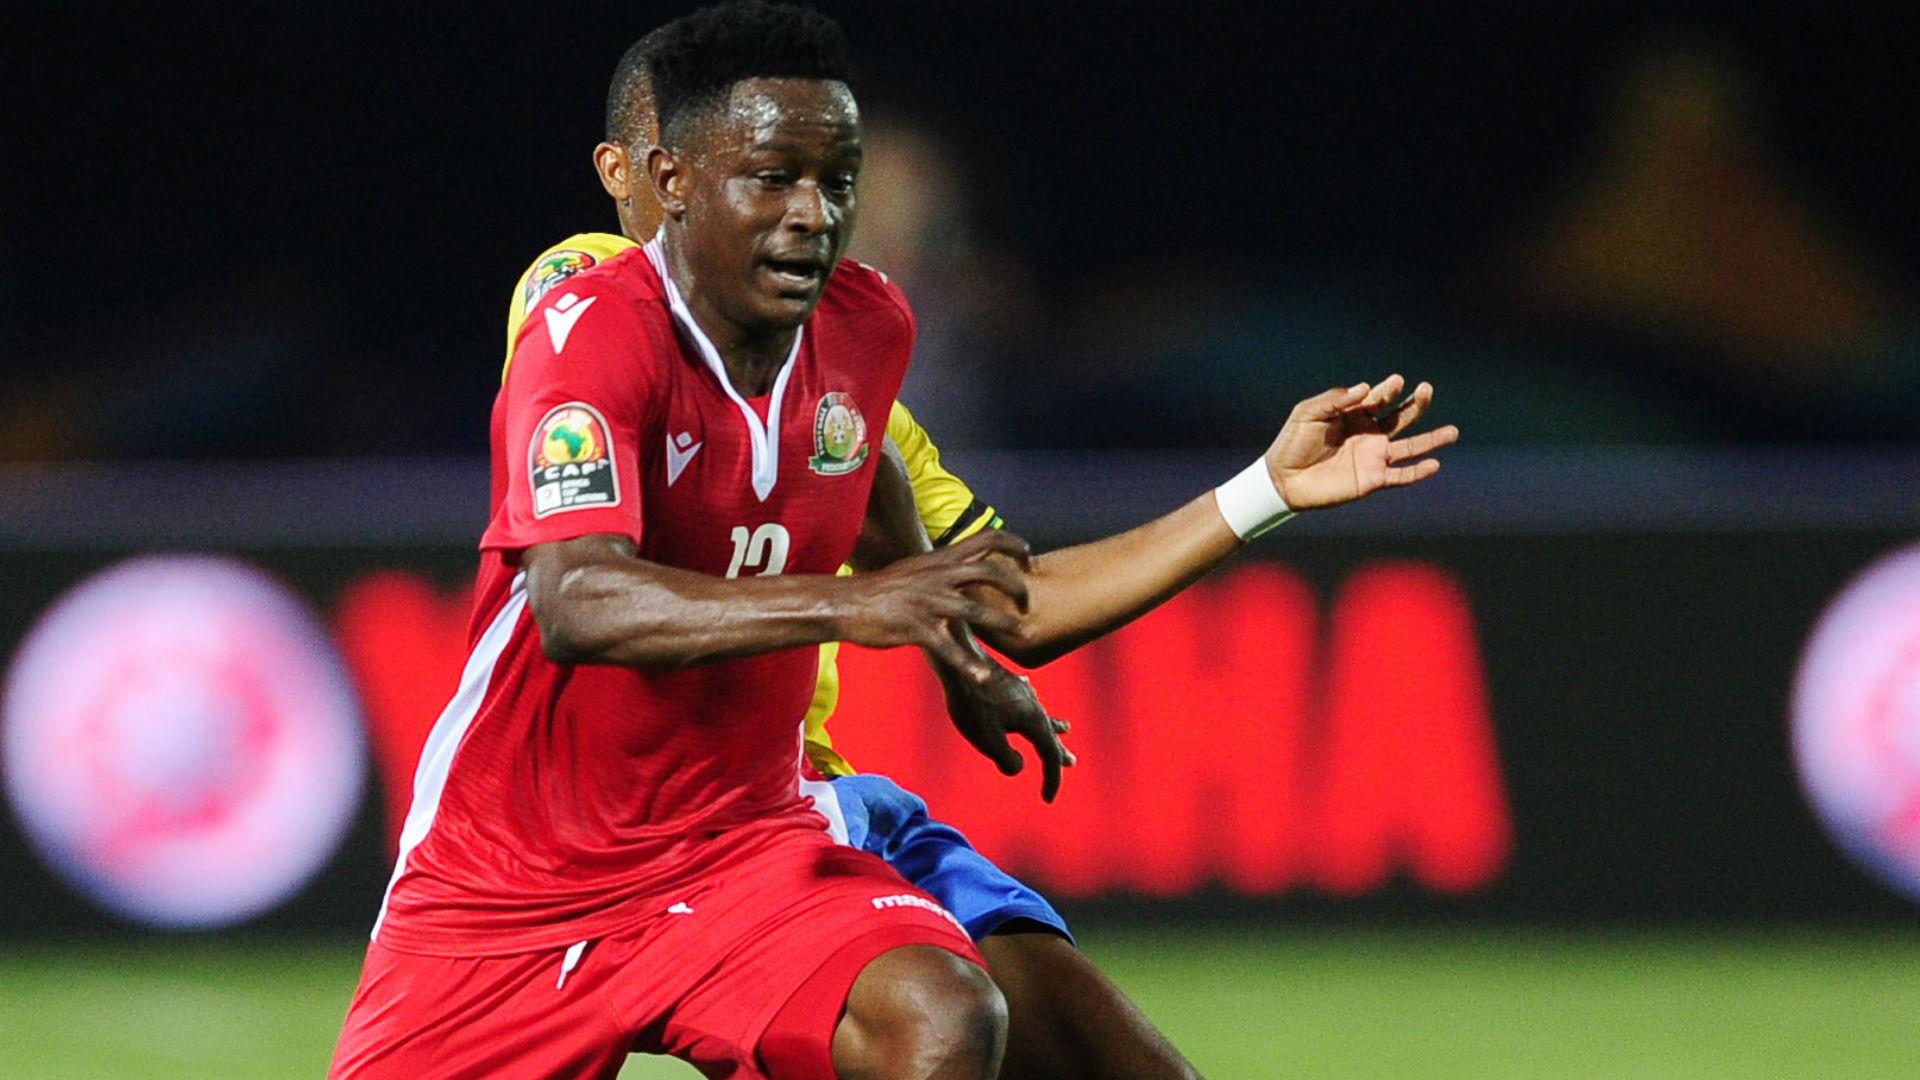 Ouma: Manchester United move is Kenya defender's dream | Goal.com